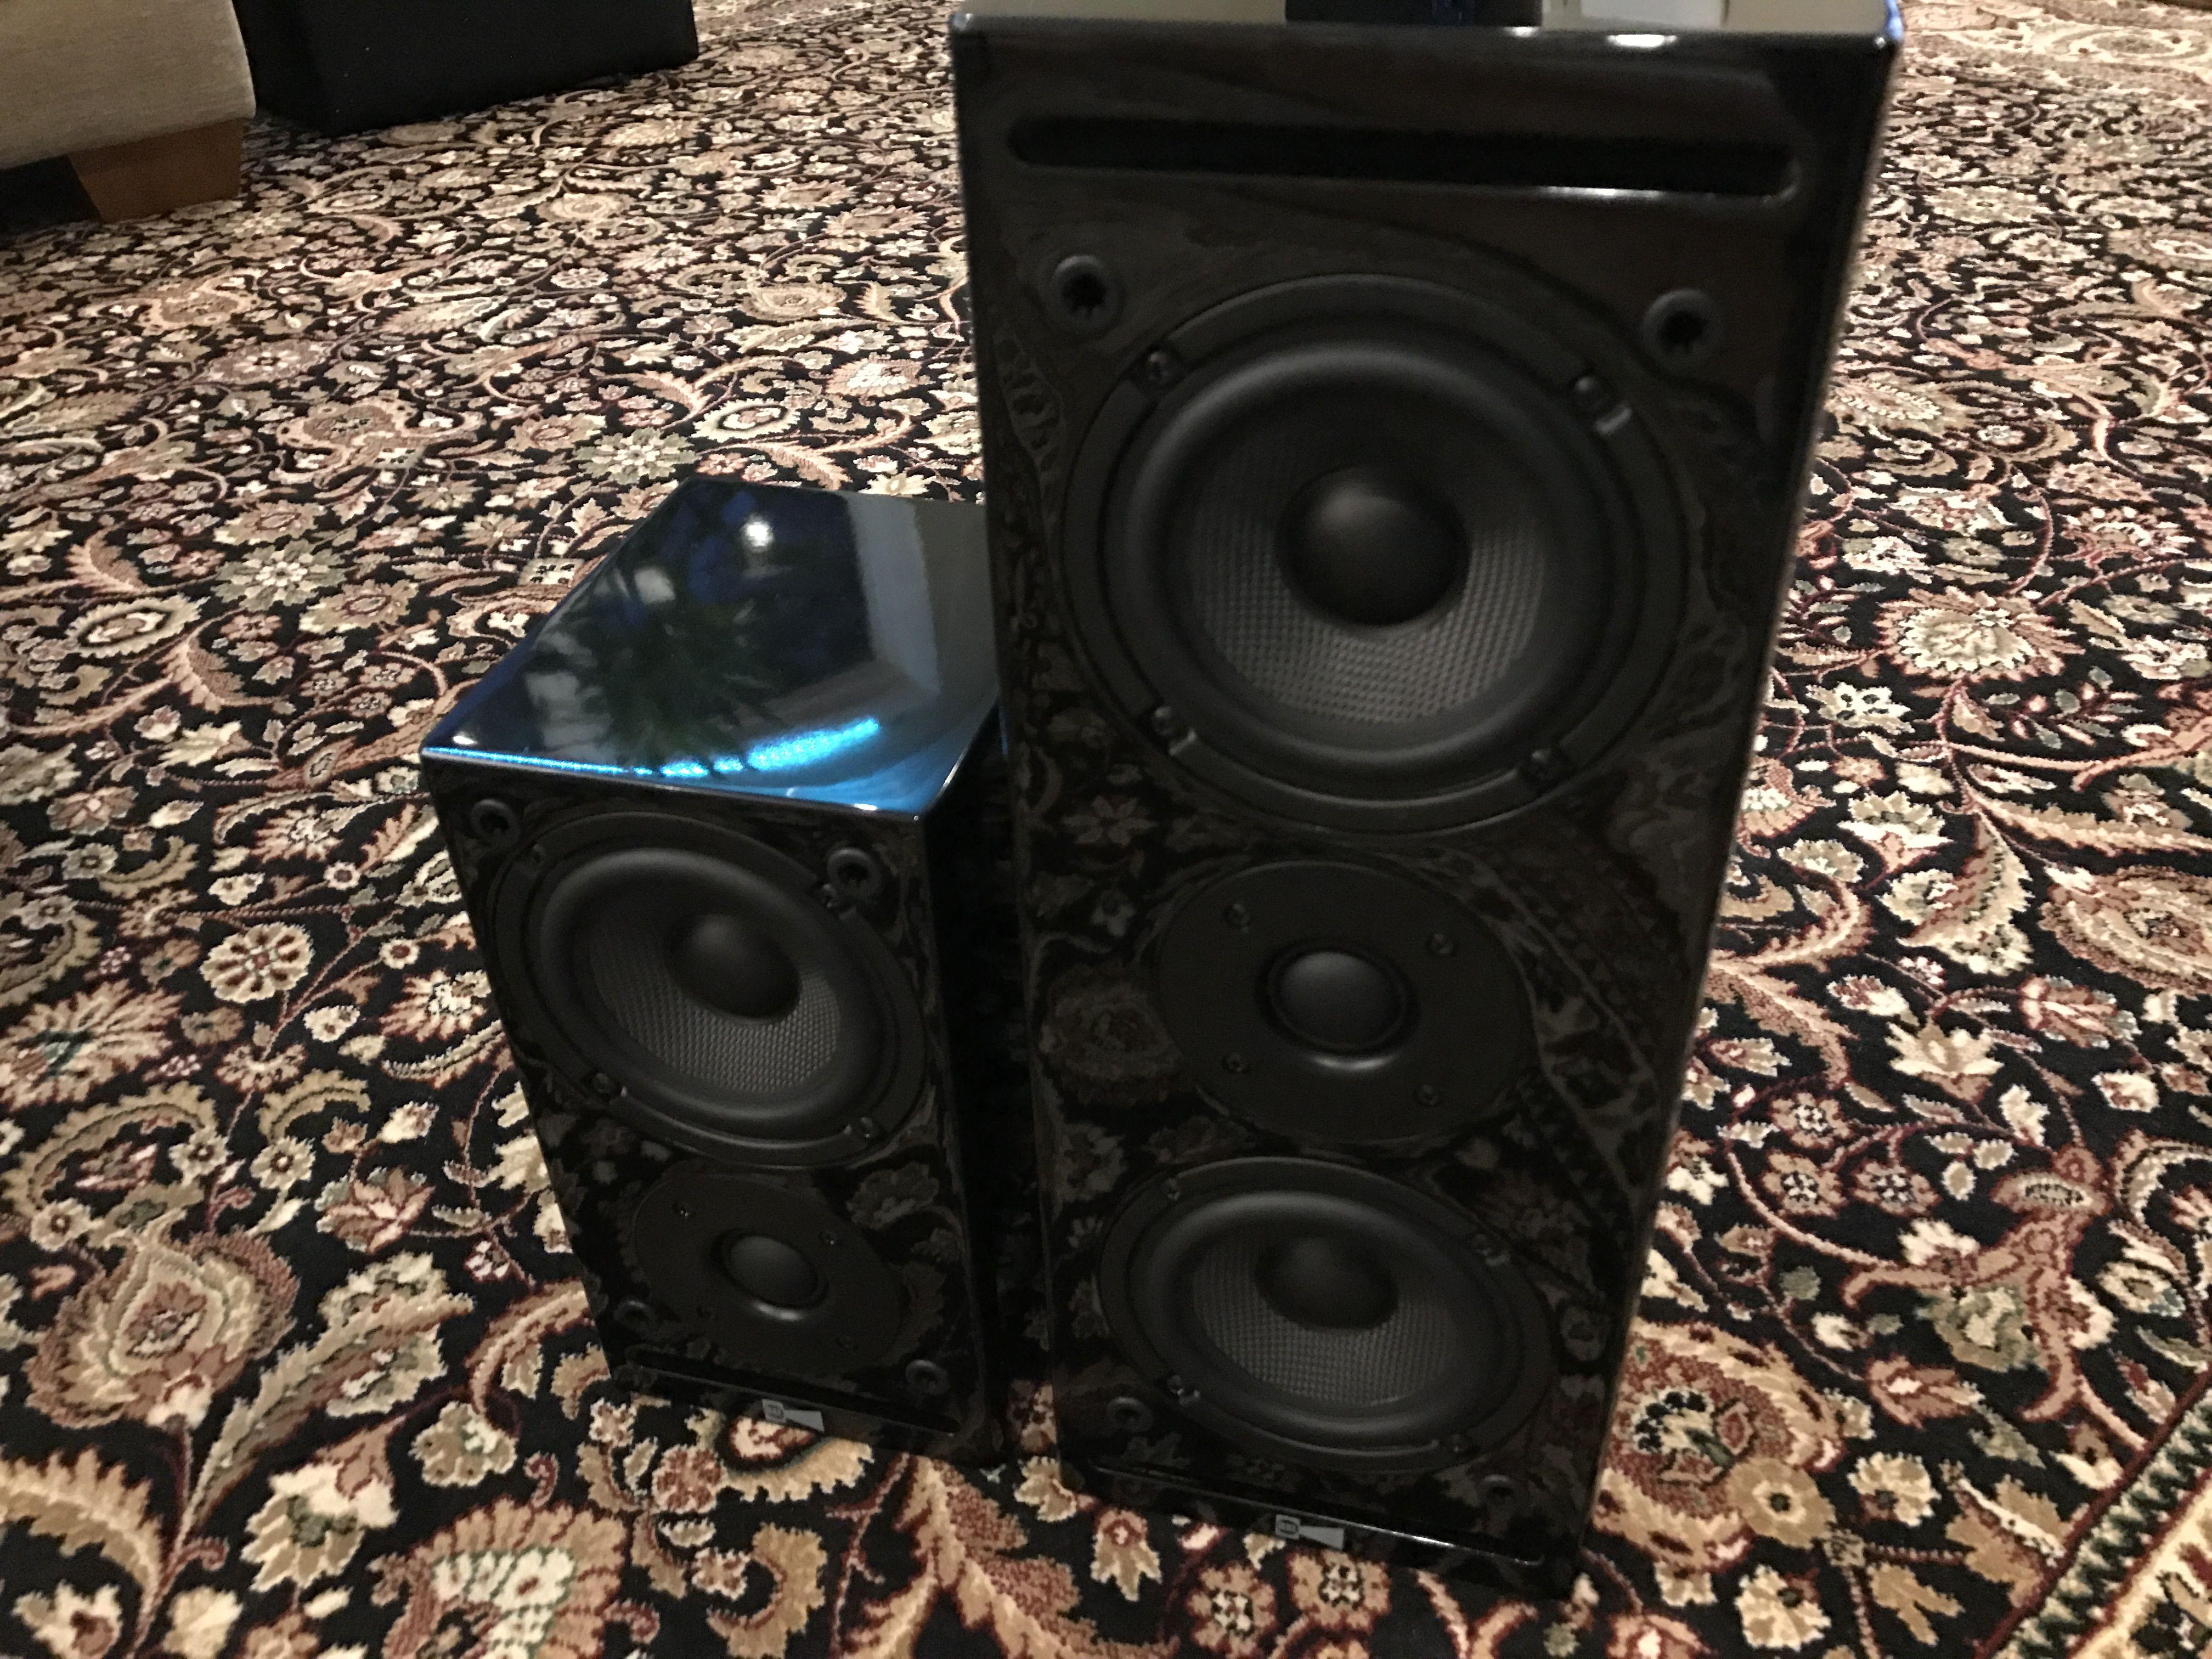 RSL CG3 loudspeaker system speakers Review with Audioholics